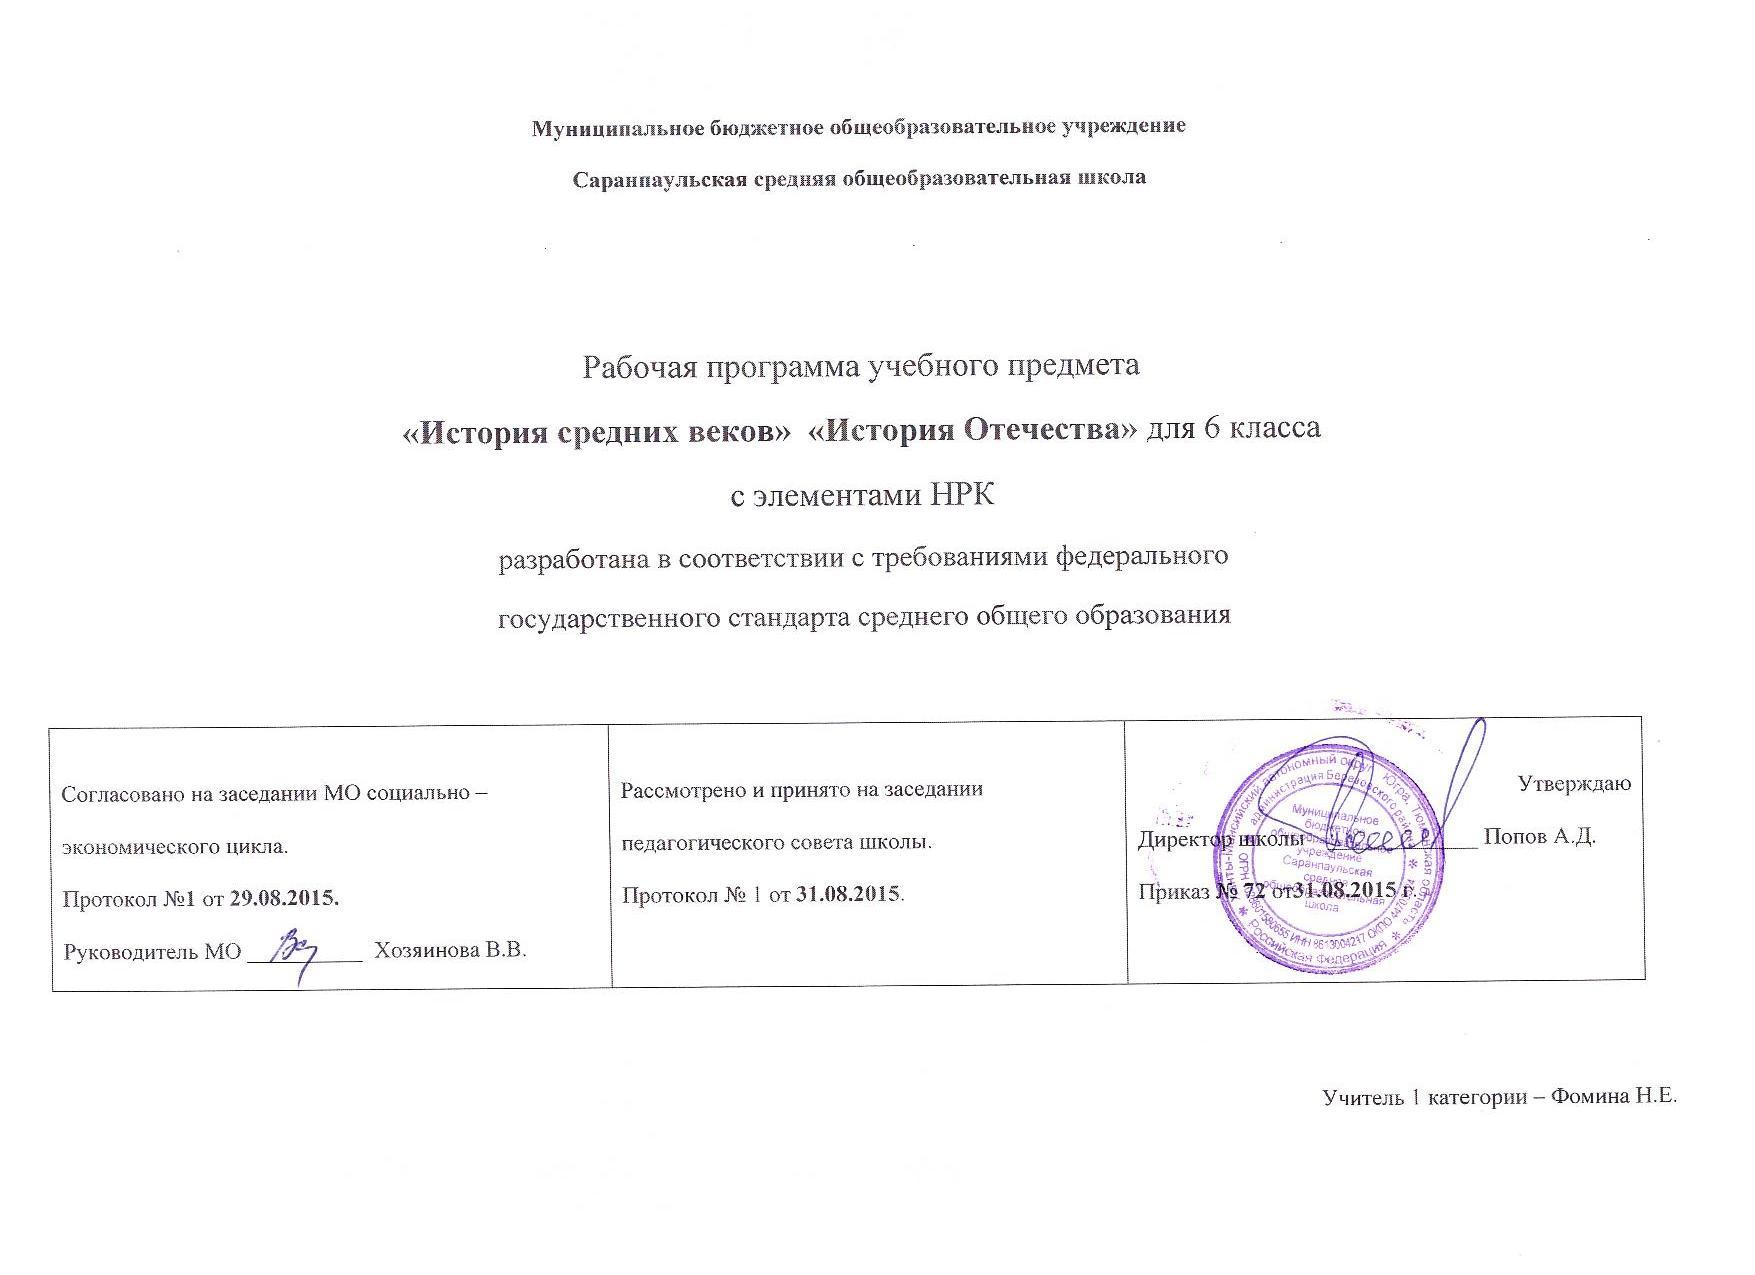 C:\Documents and Settings\1\Рабочий стол\Изображение.jpg